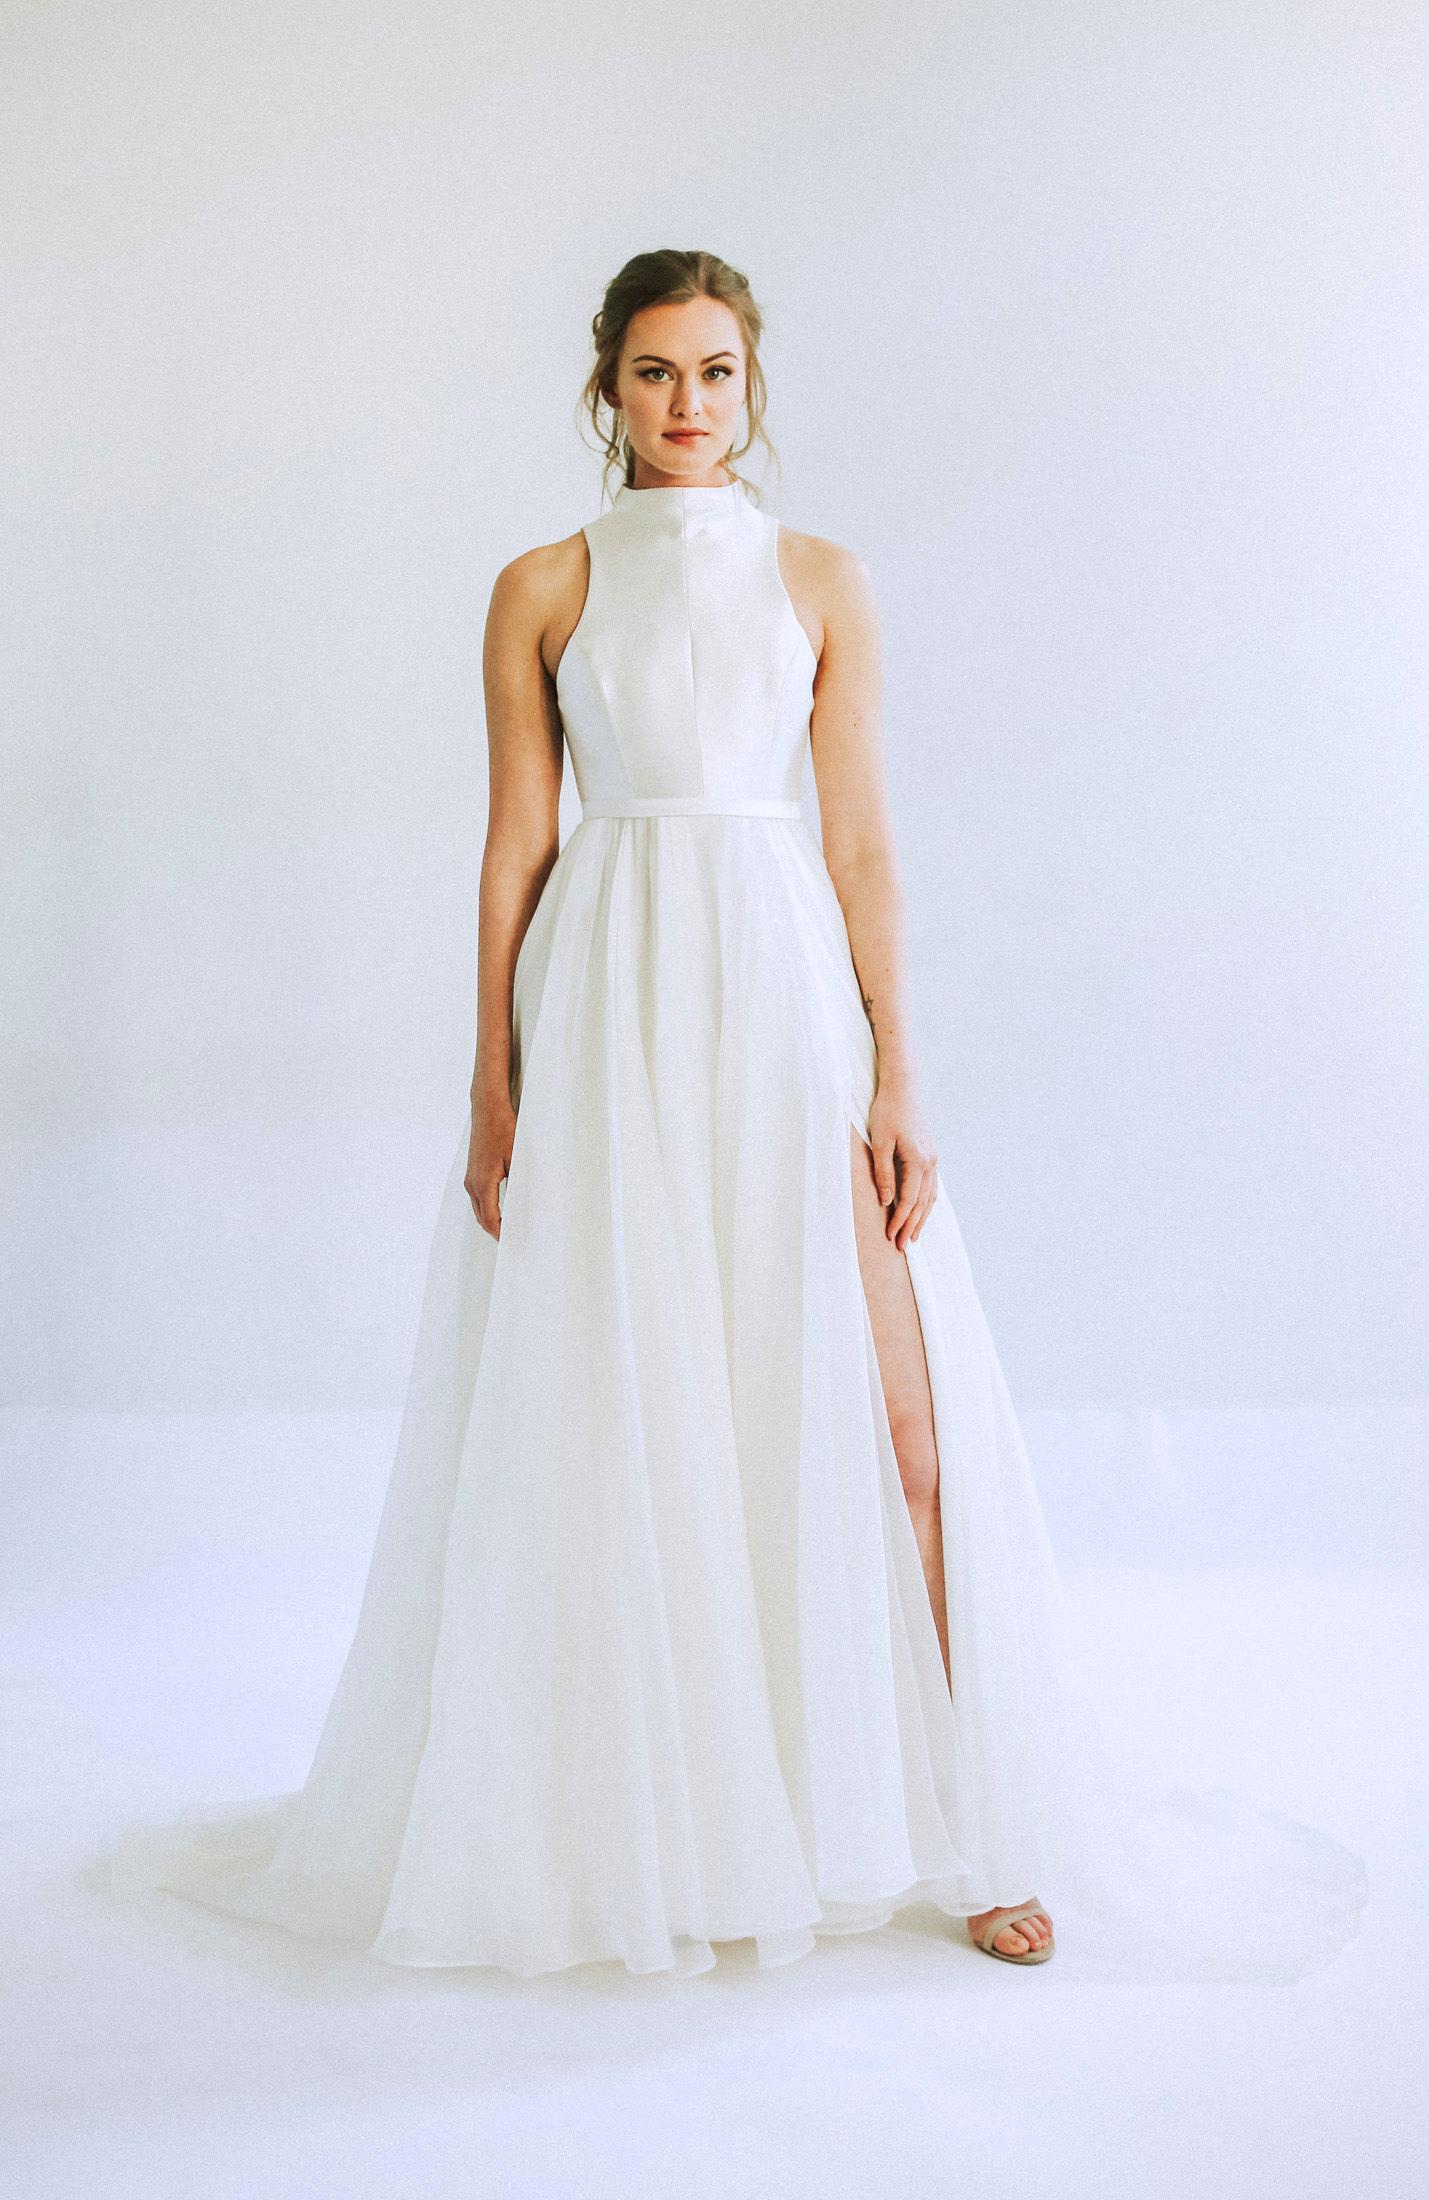 leanna marshall halter top sleeveless wedding dress spring 2020